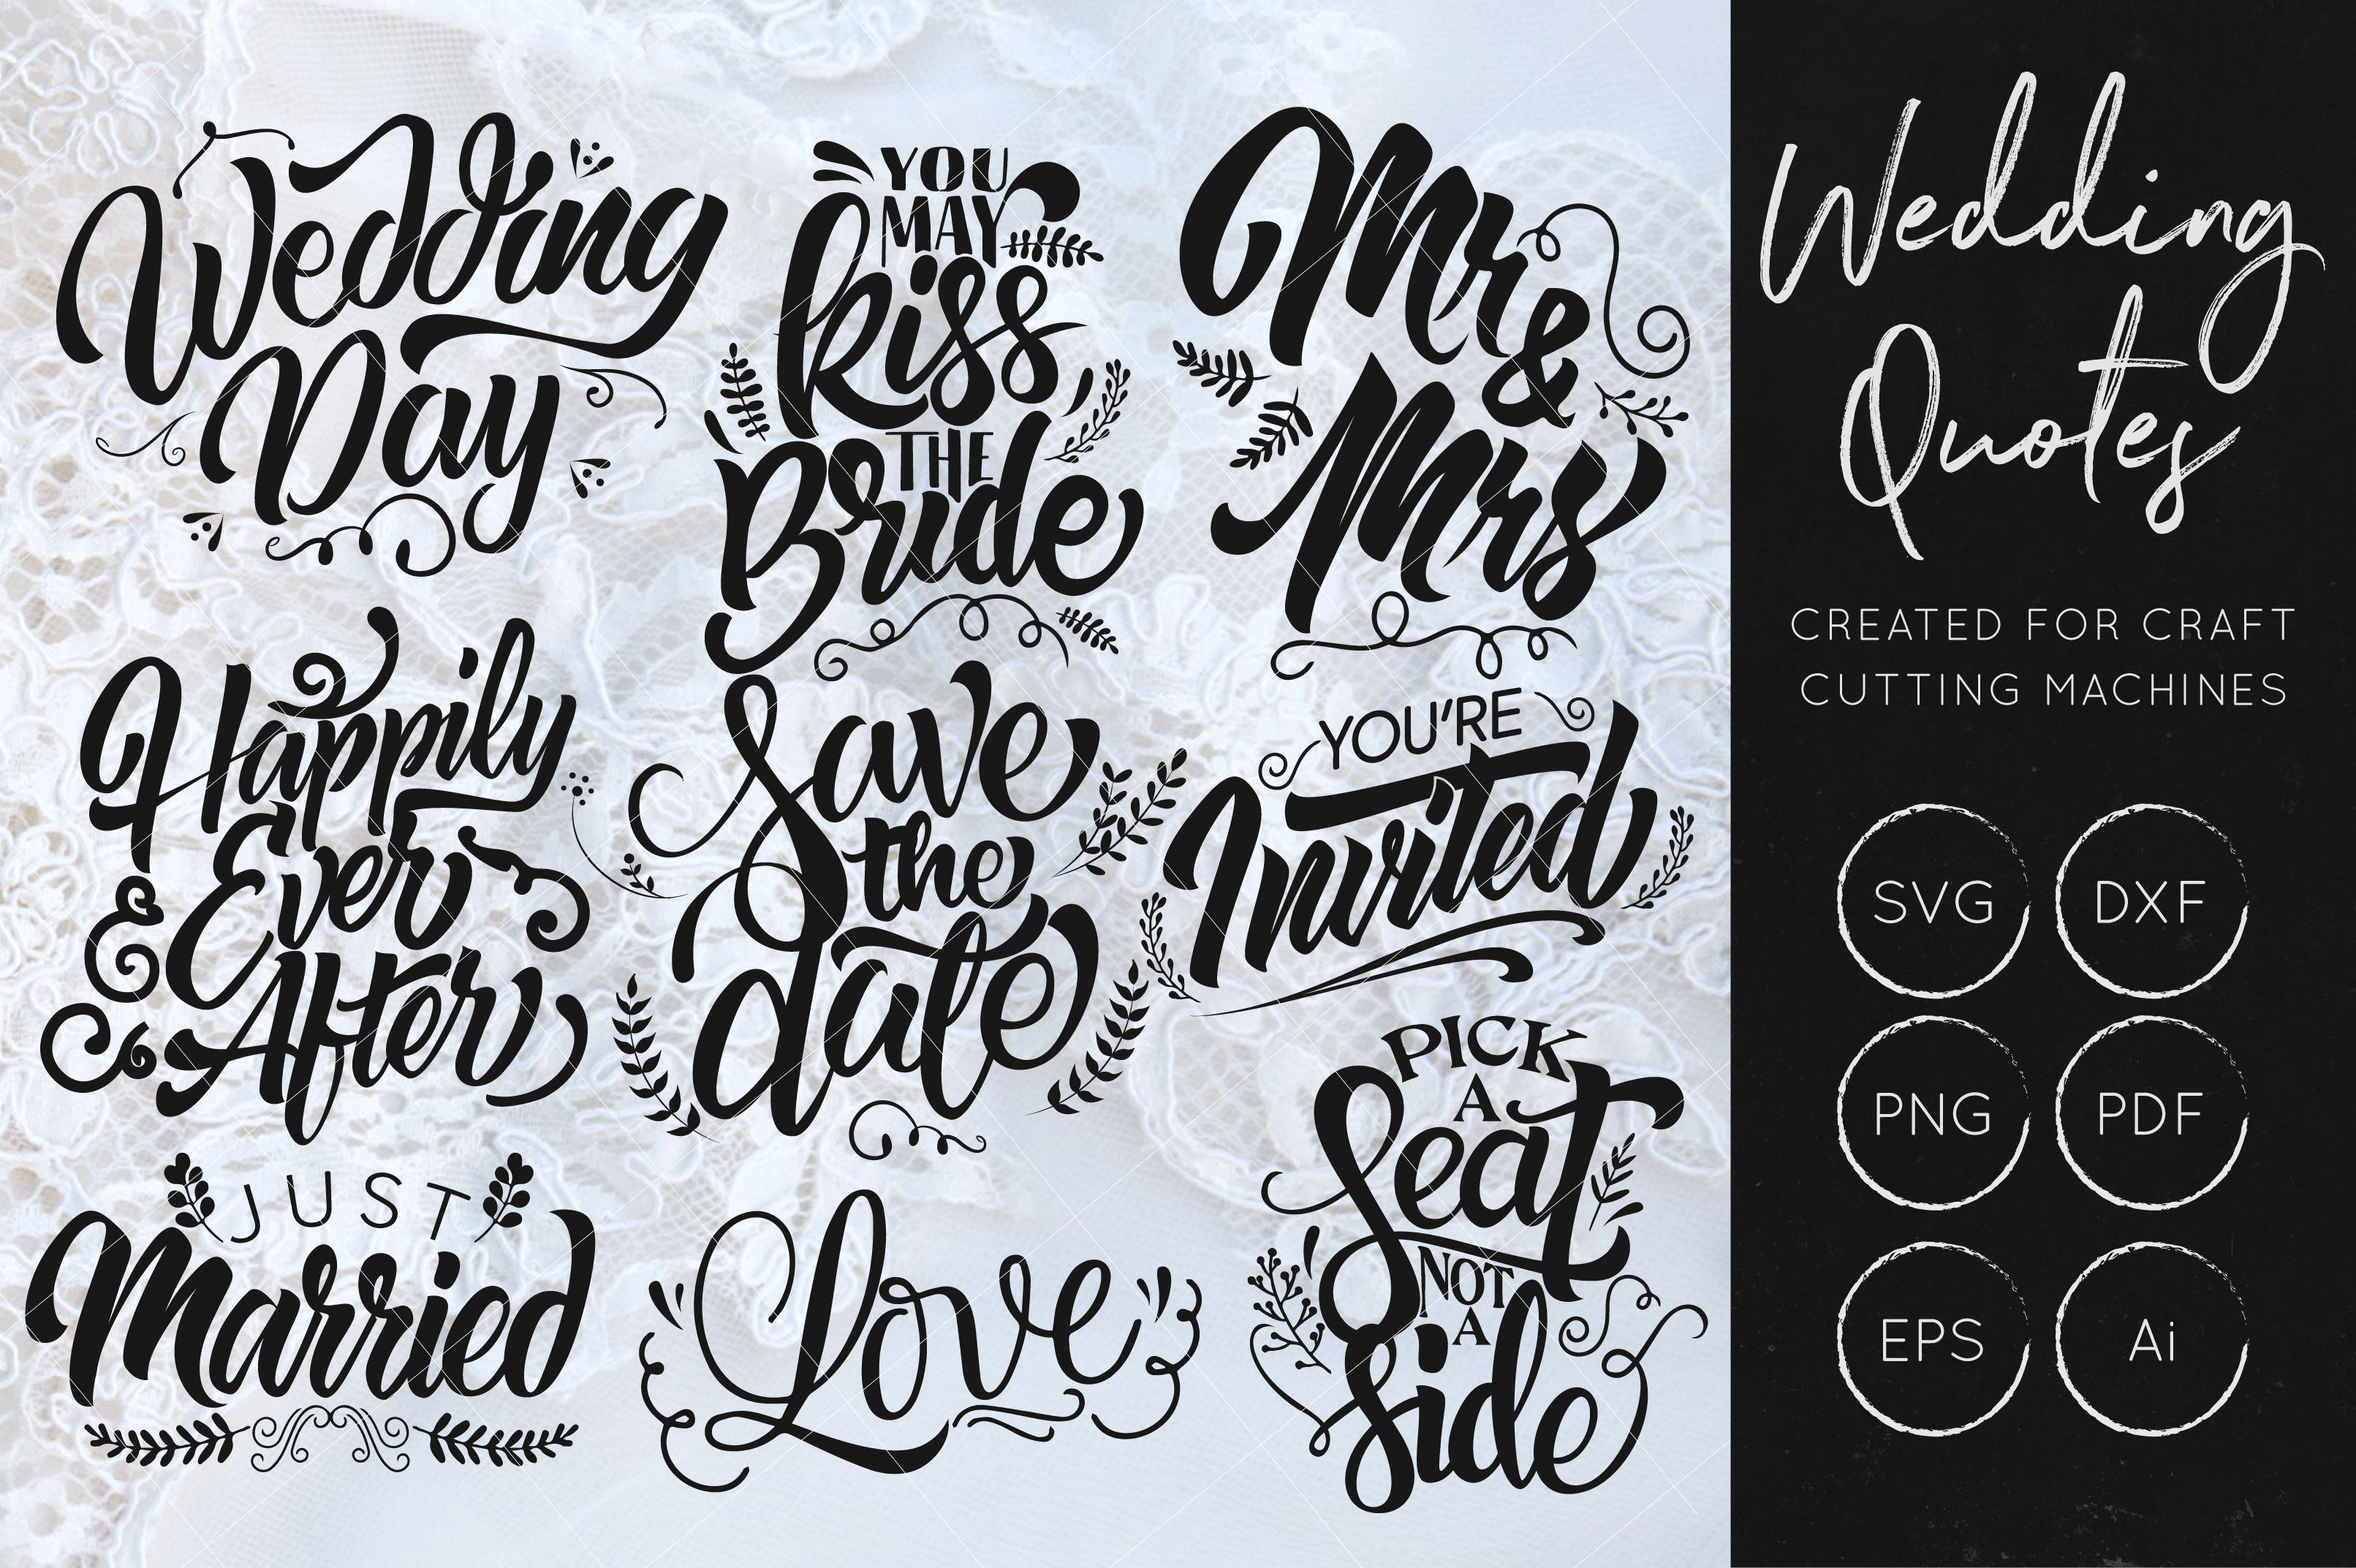 Wedding SVG Cut Files Bundle - Wedding Quotes - Wedding SVG example image 1